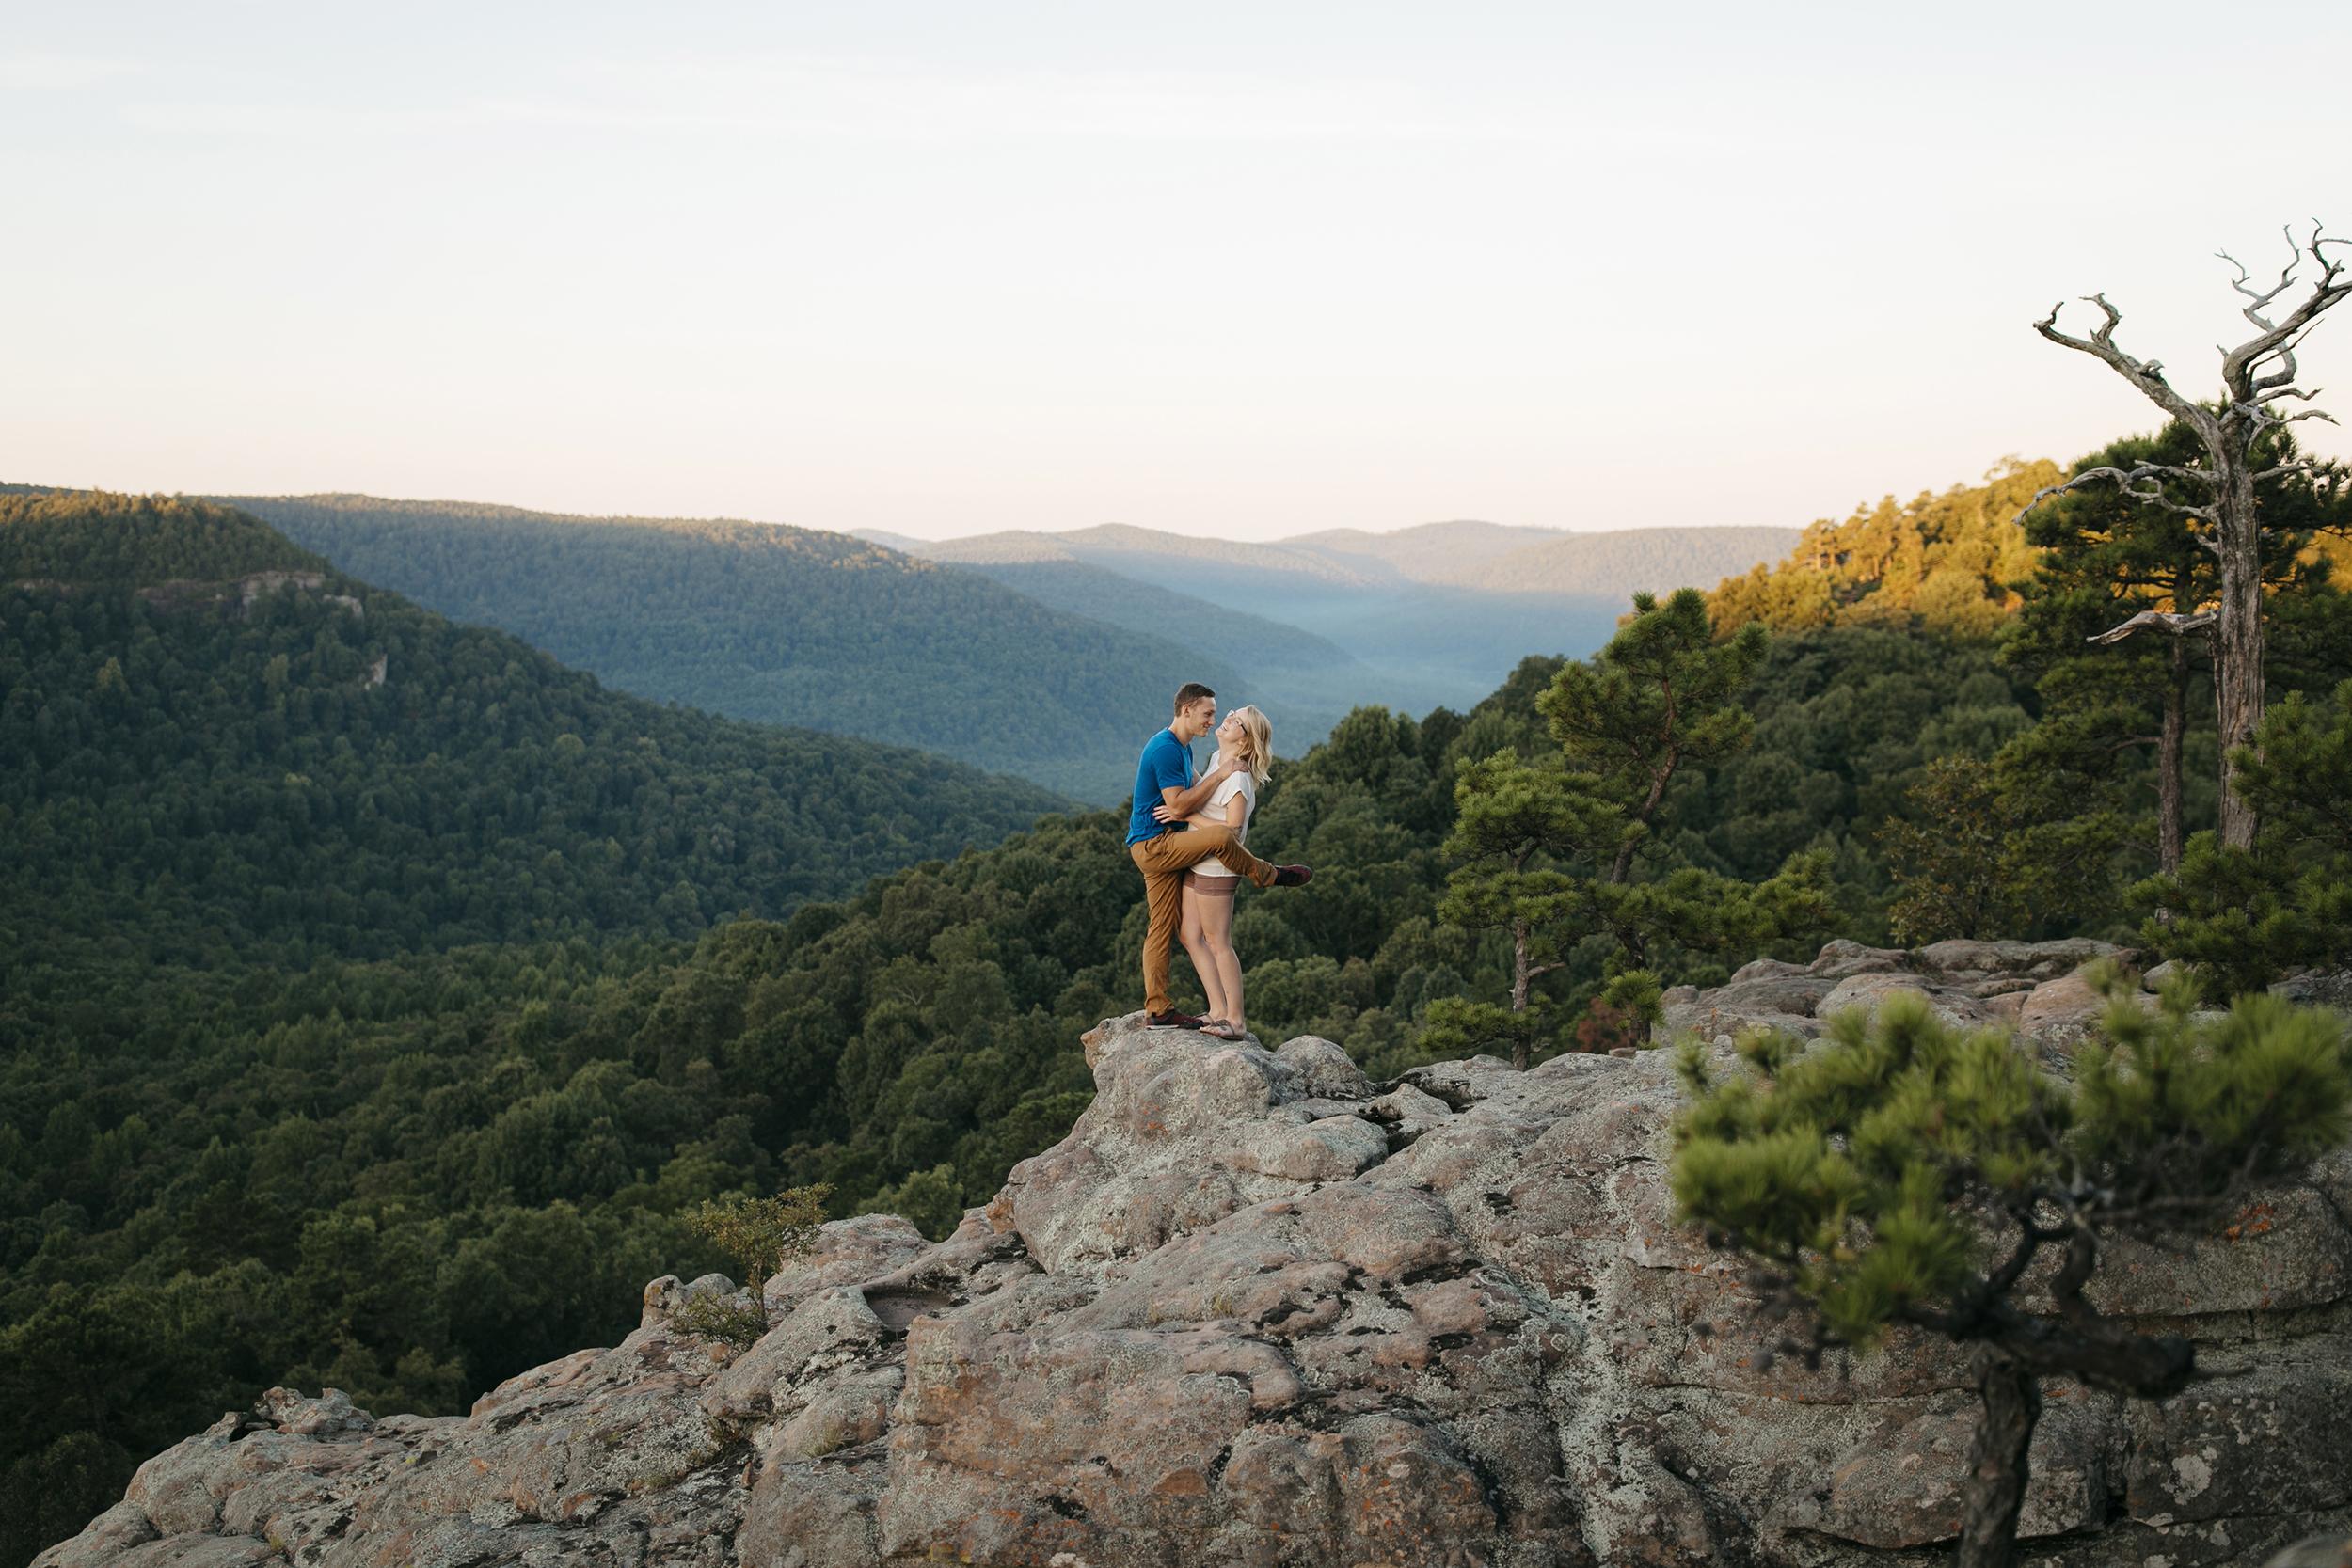 Buffalo-River-Arkansas-Sams-Throne-Adventure-Engagement-Photographer106.JPG